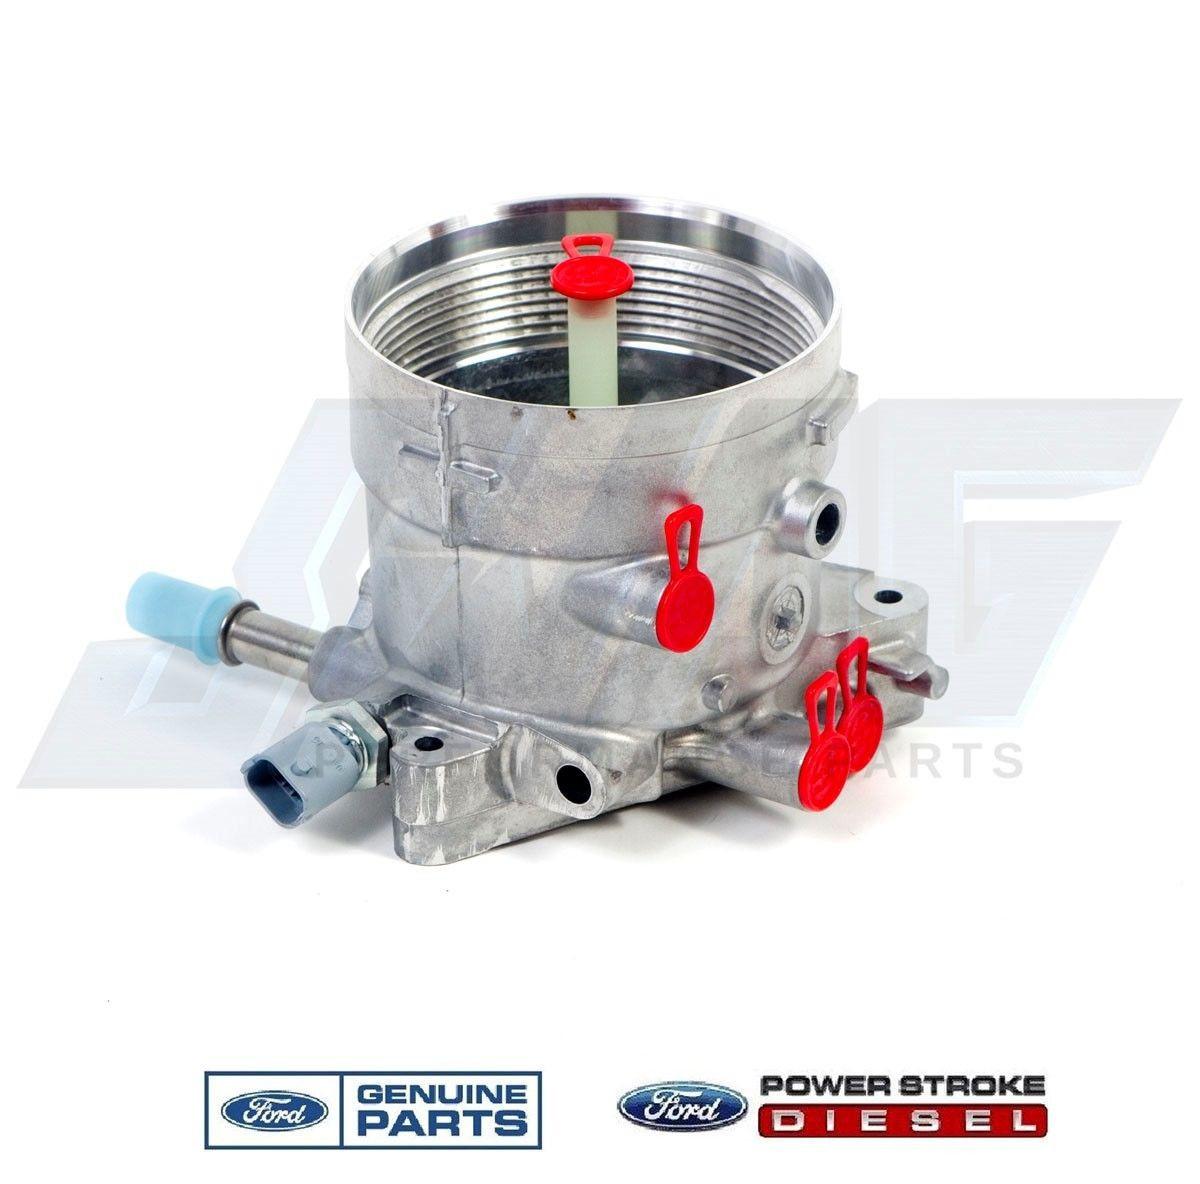 08-10 6.4L Powerstroke Diesel Genuine OEM Ford Fuel Filter Pump Tube F250 F350